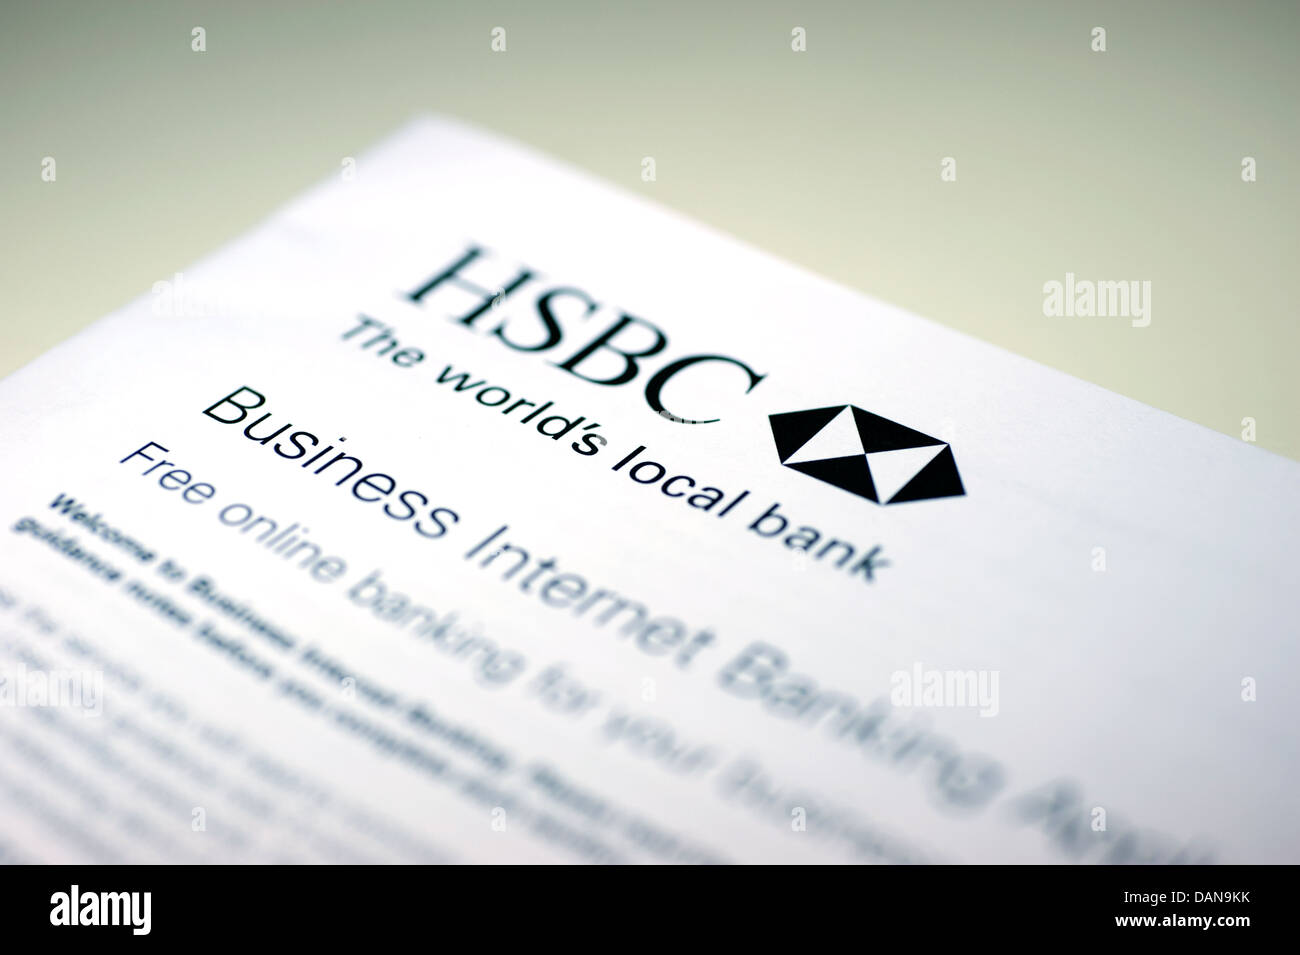 Online Banking Security Hsbc Stock Photos & Online Banking Security